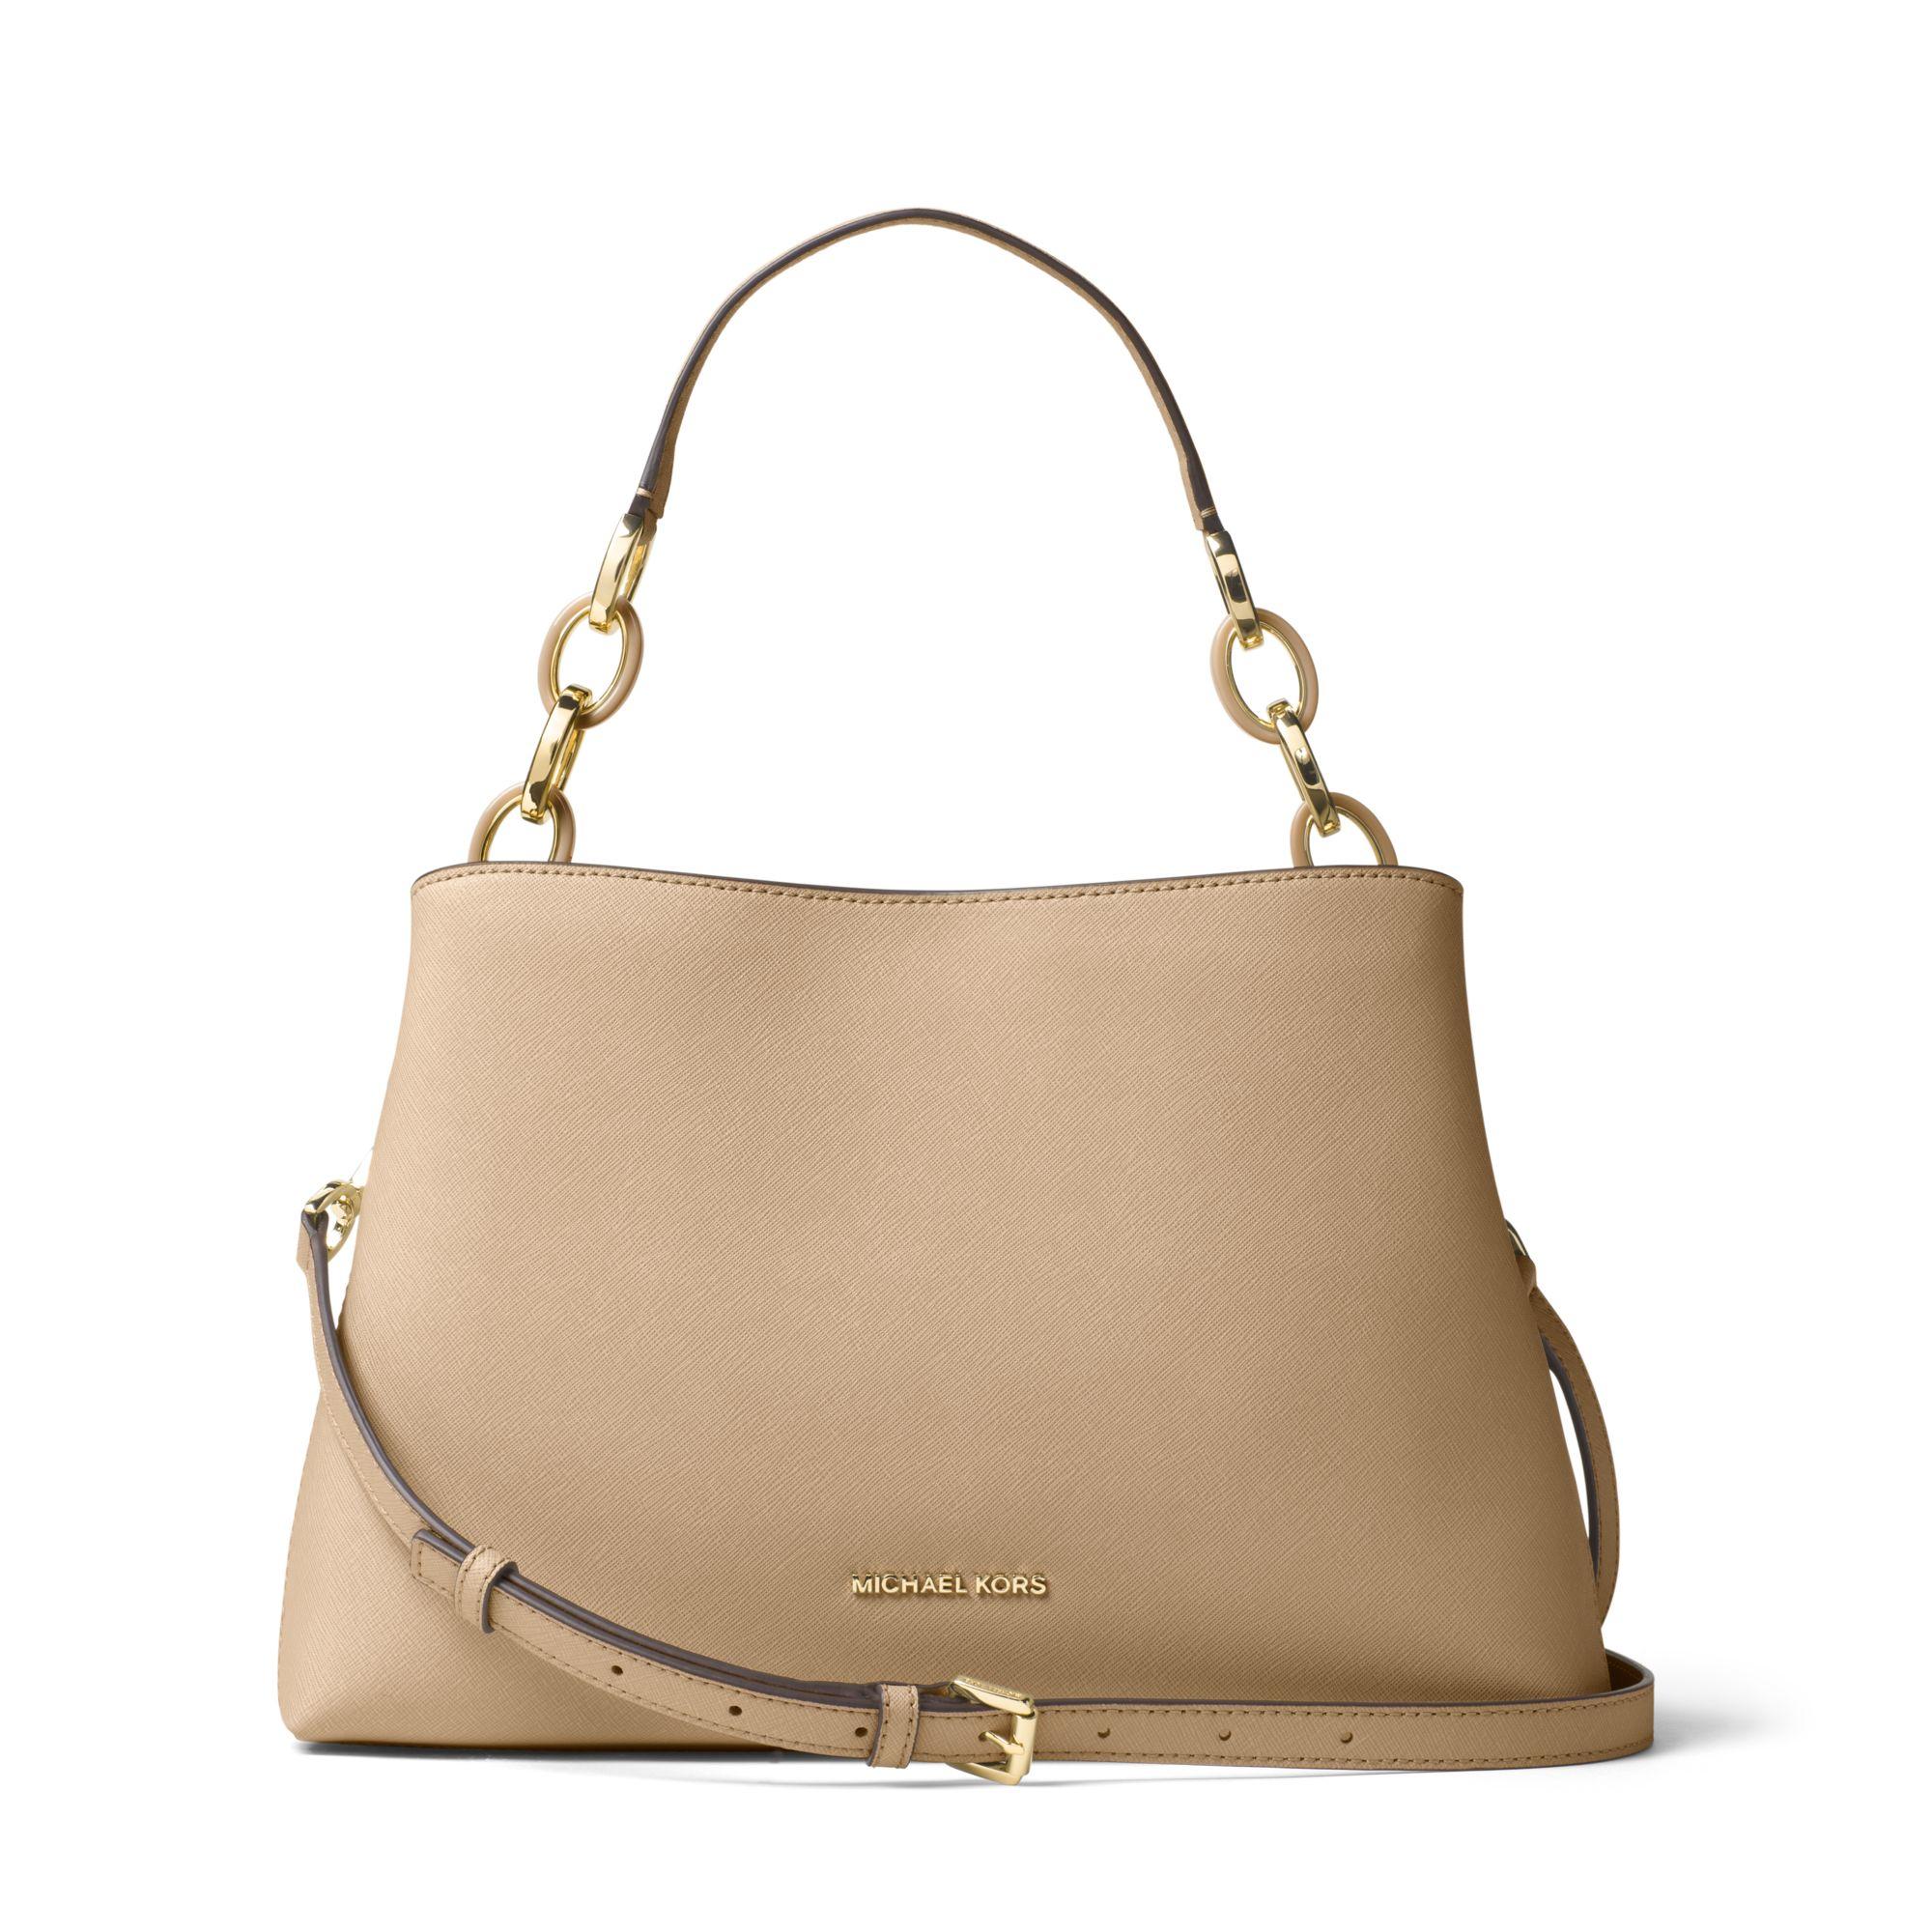 michael kors portia large saffiano leather shoulder bag in